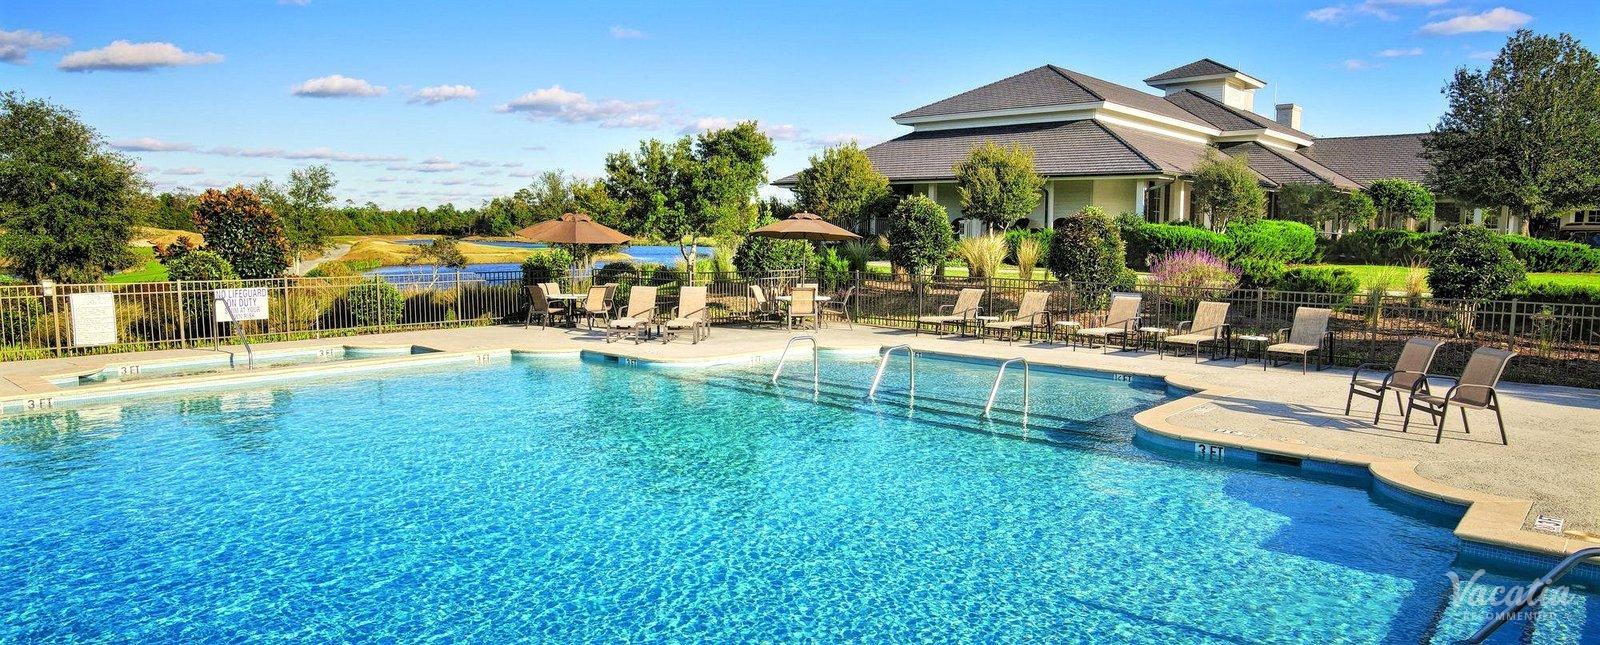 Wyndham Dye Villas Myrtle Beach Sc Vacatia